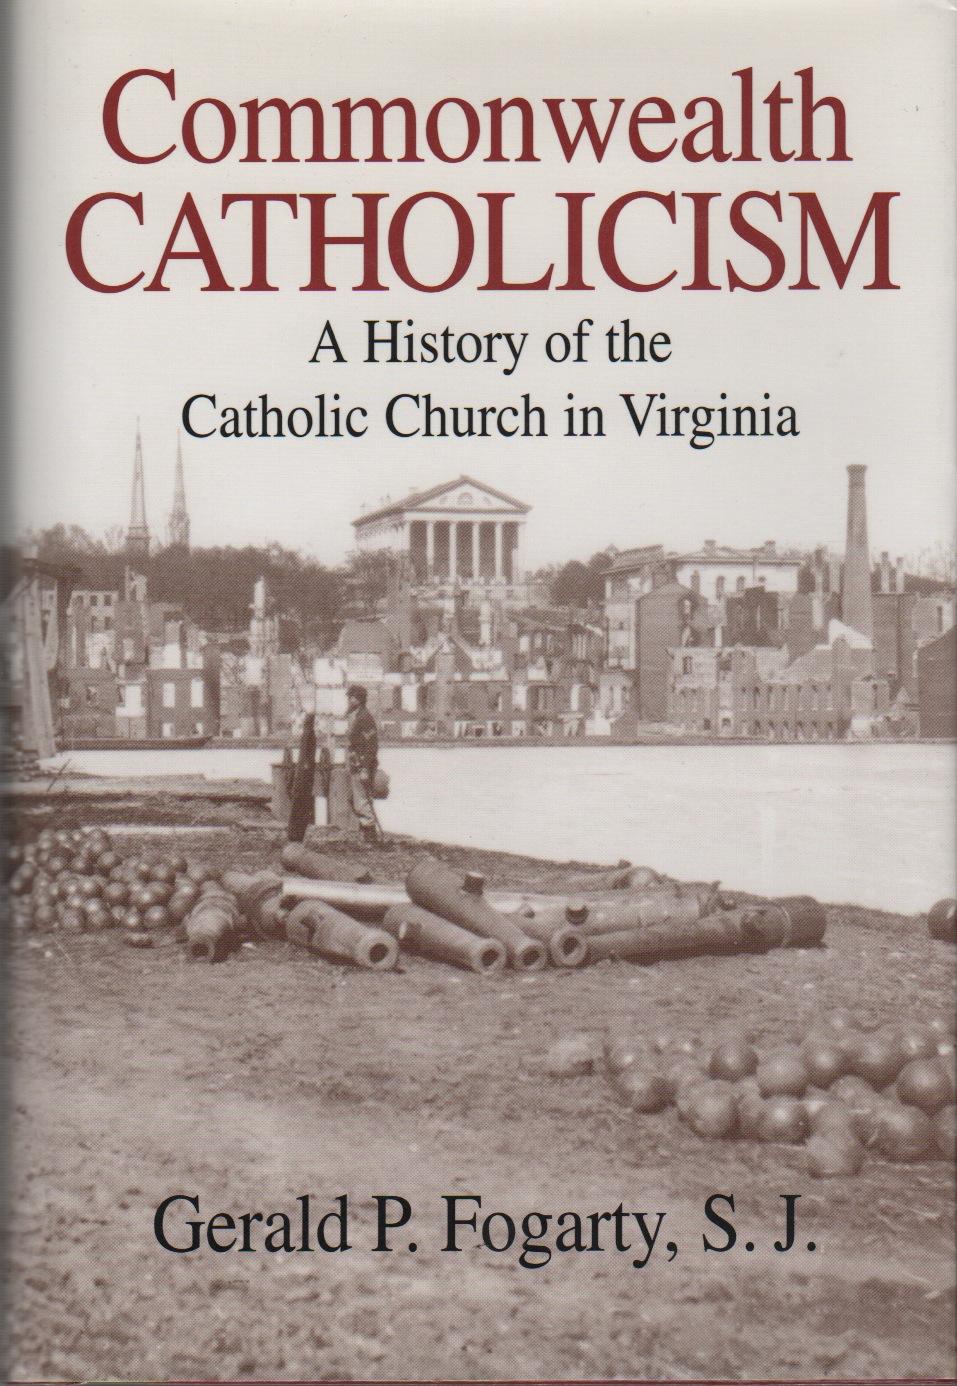 Commonwealth Catholicism Fogarty